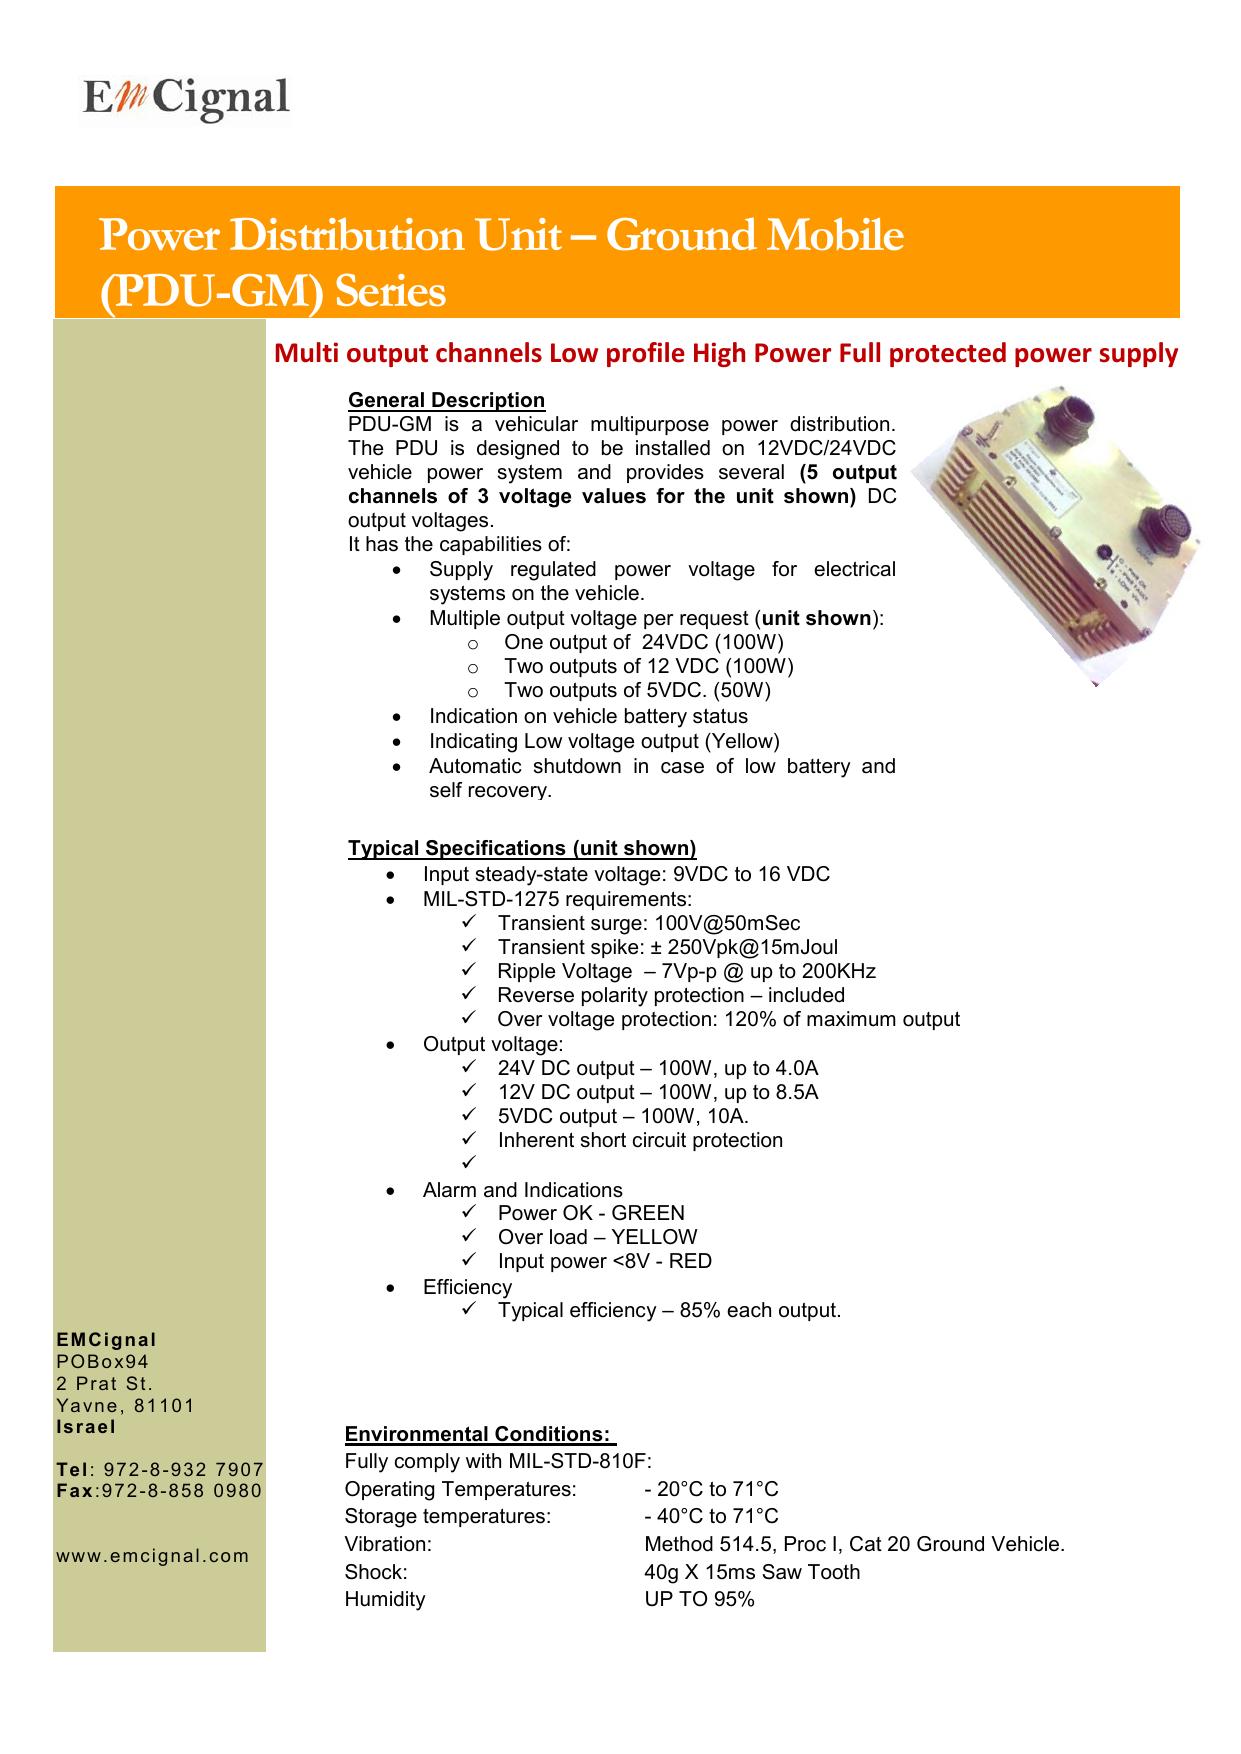 Power Distribution Unit – Ground Mobile (PDU-GM | manualzz com